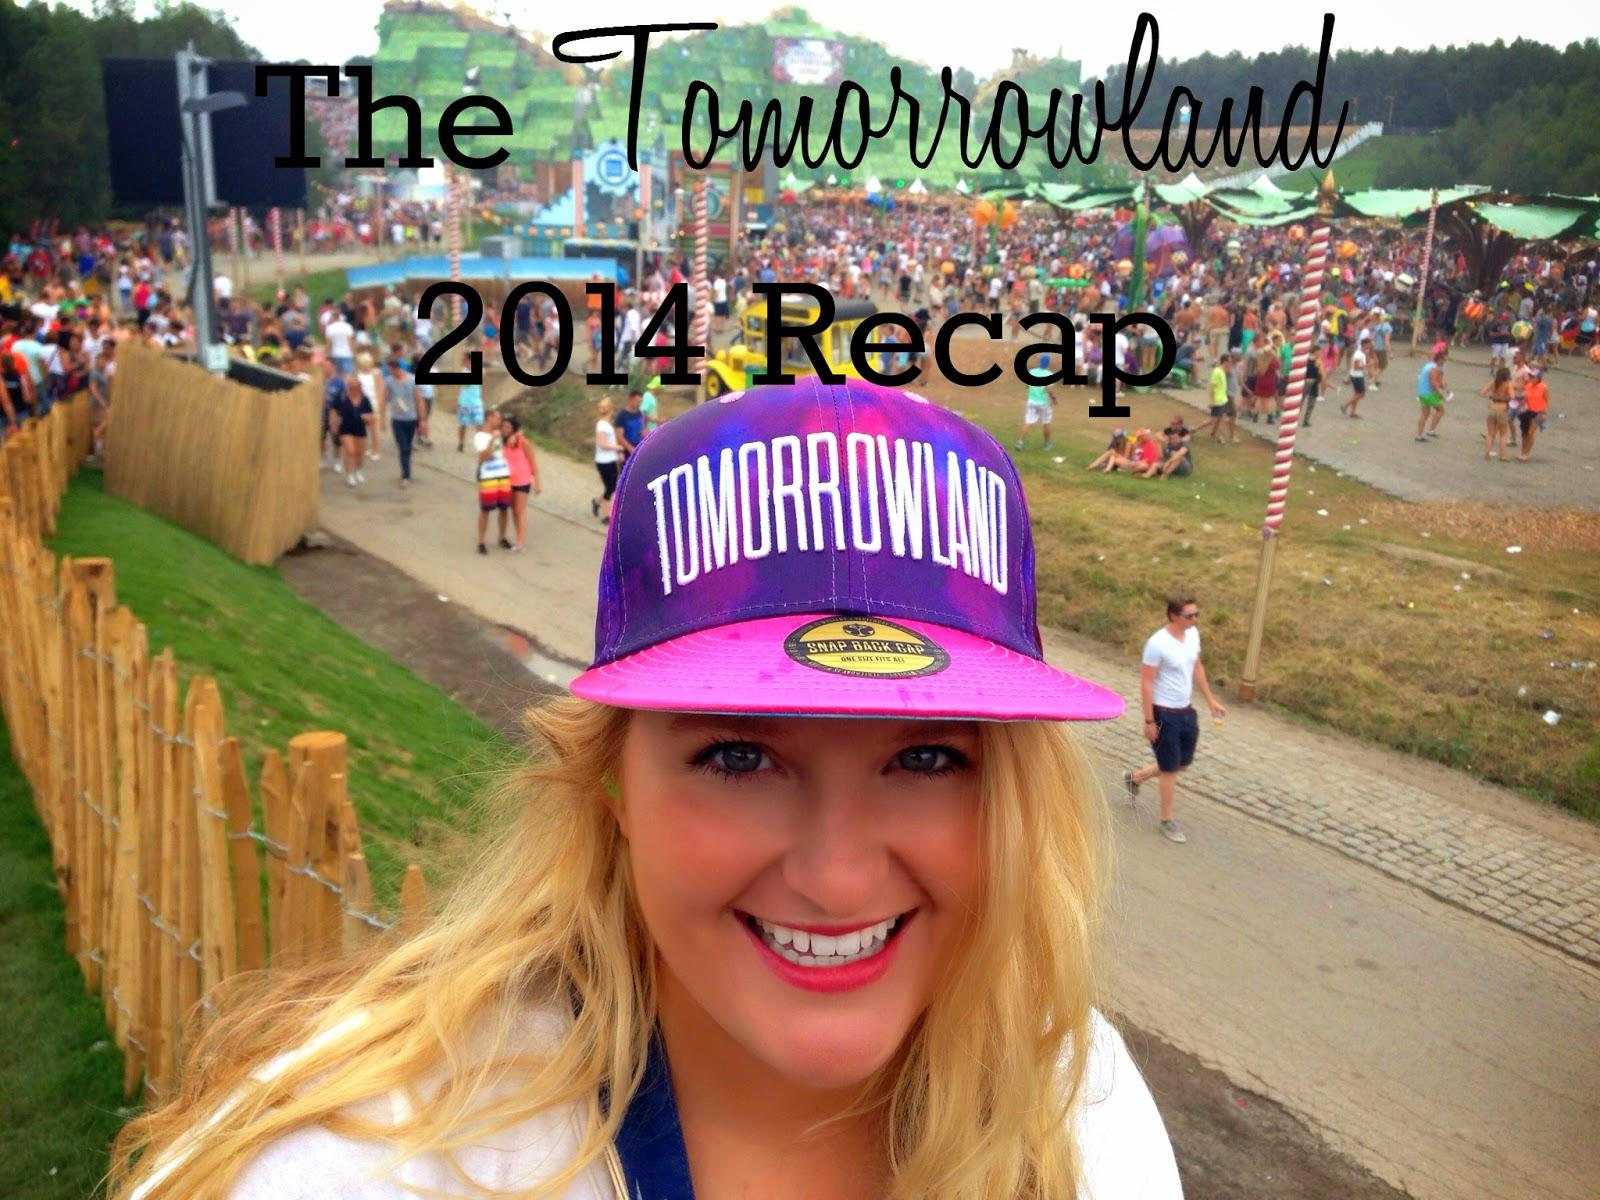 The Tomorrowland 2014 Recap